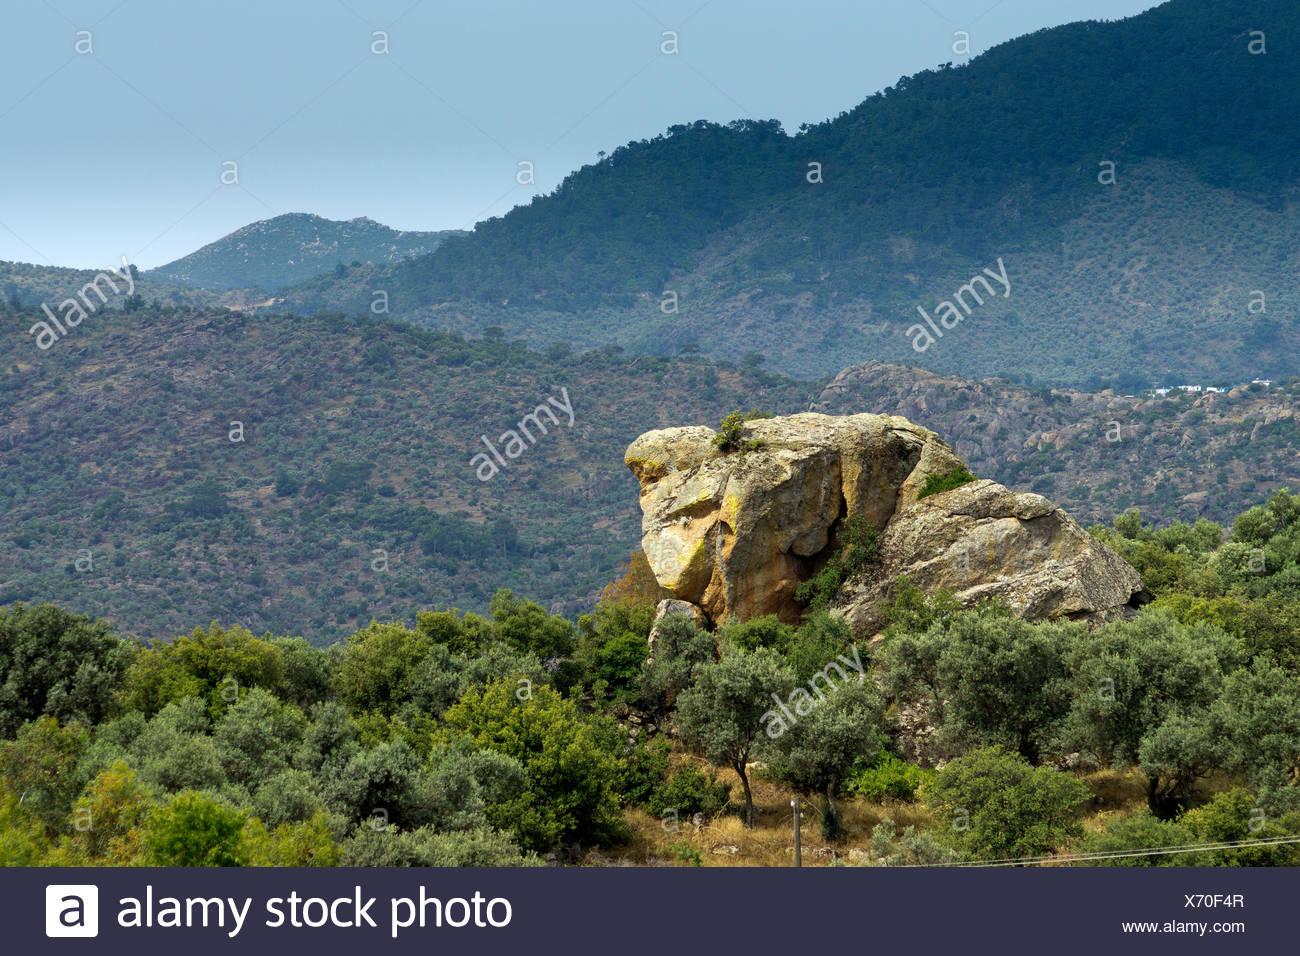 Formaciones rocosas peculiares, montañas Besparmak Daglari Kapikiri, Mus, Turquía, Asia Imagen De Stock